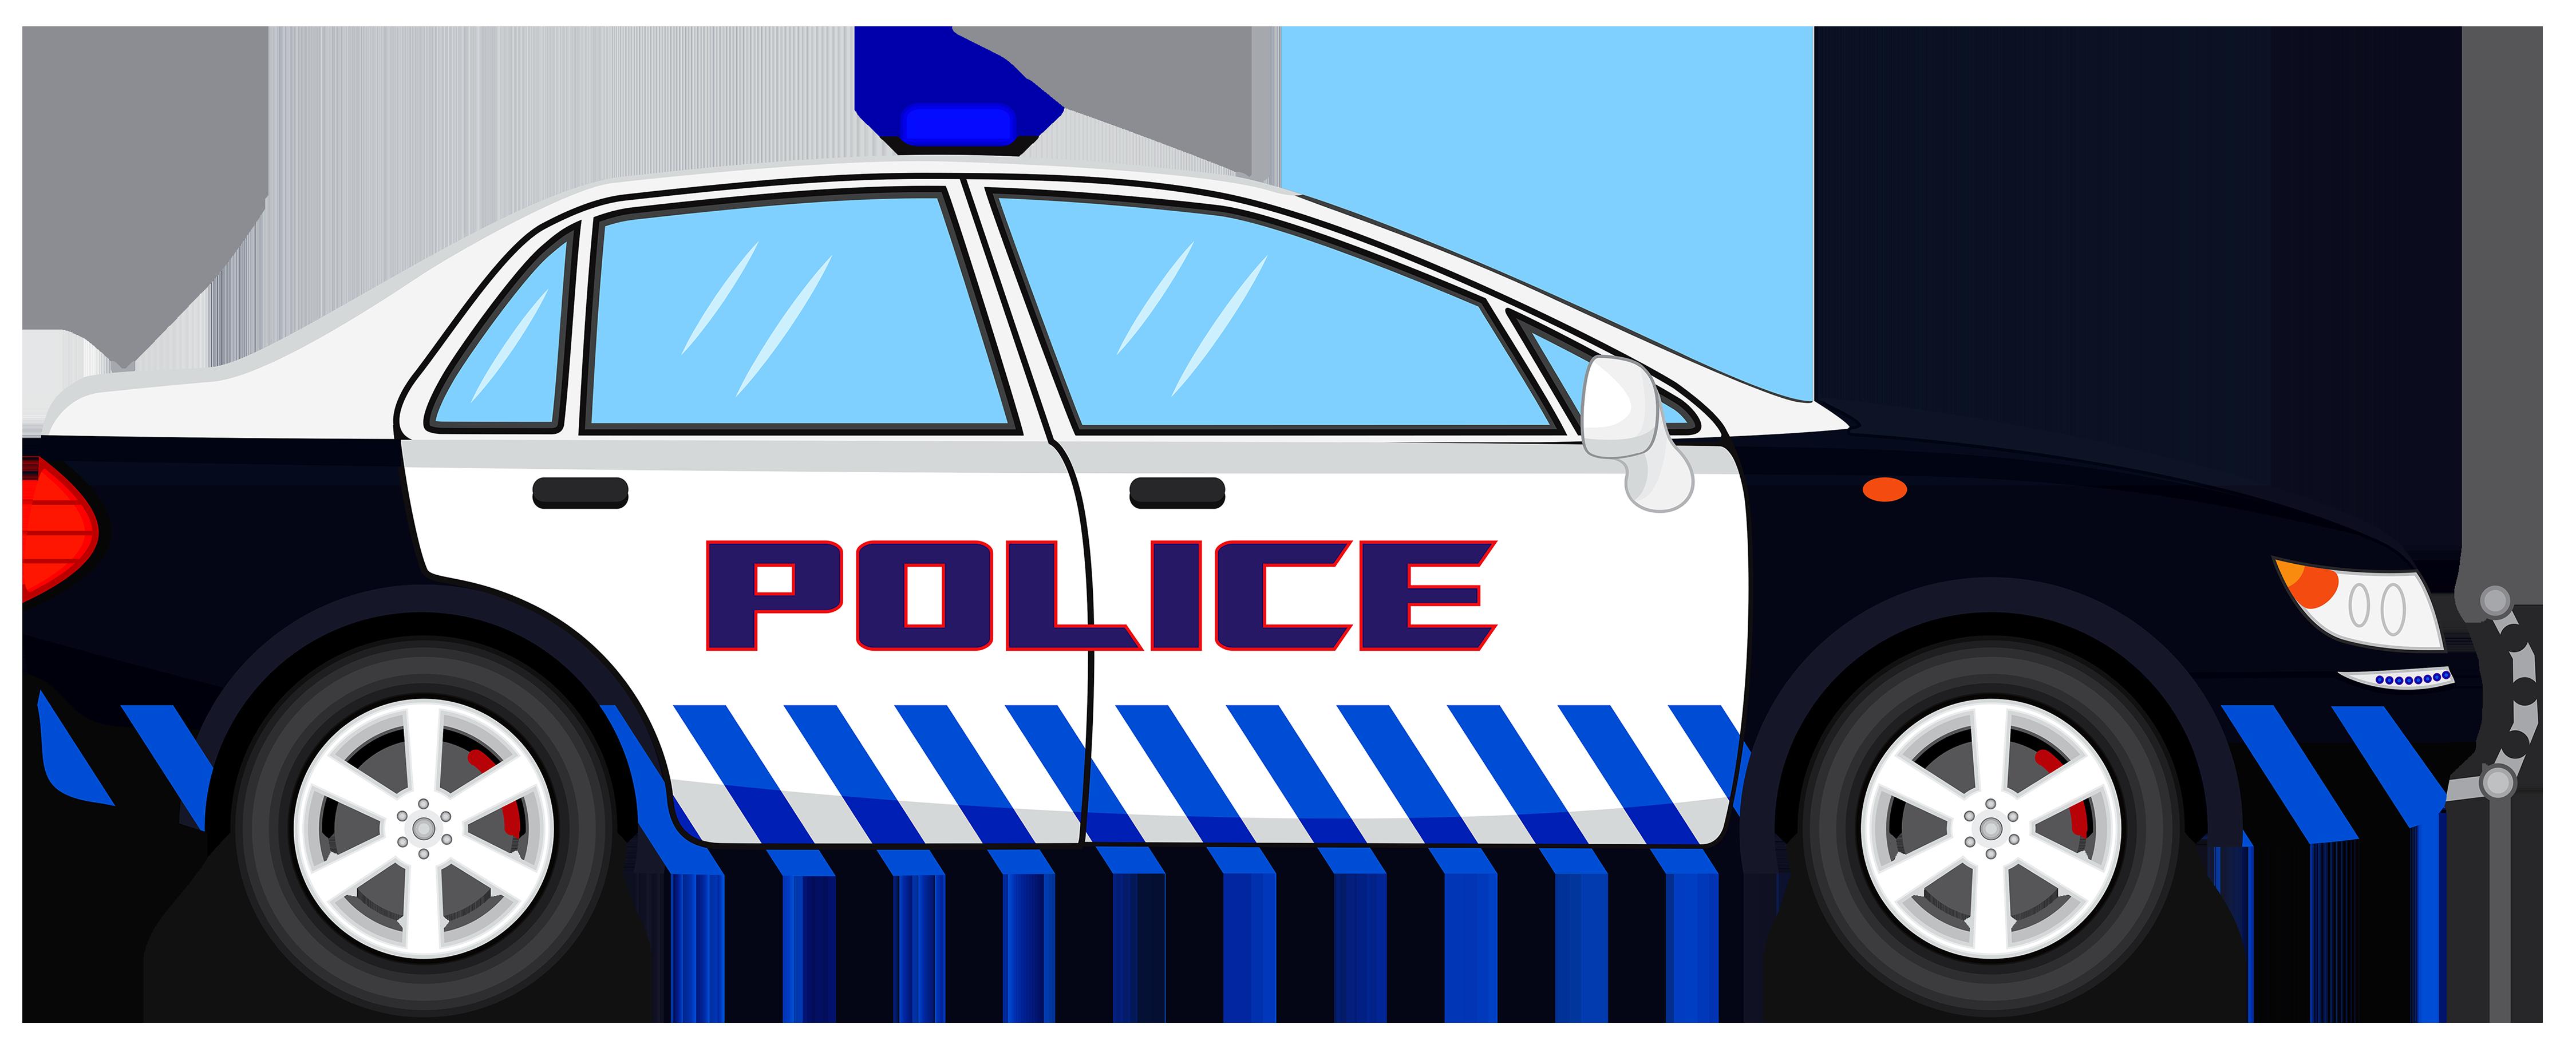 4500x1817 Police Car Transparent Png Clip Art Imageu200b Gallery Yopriceville